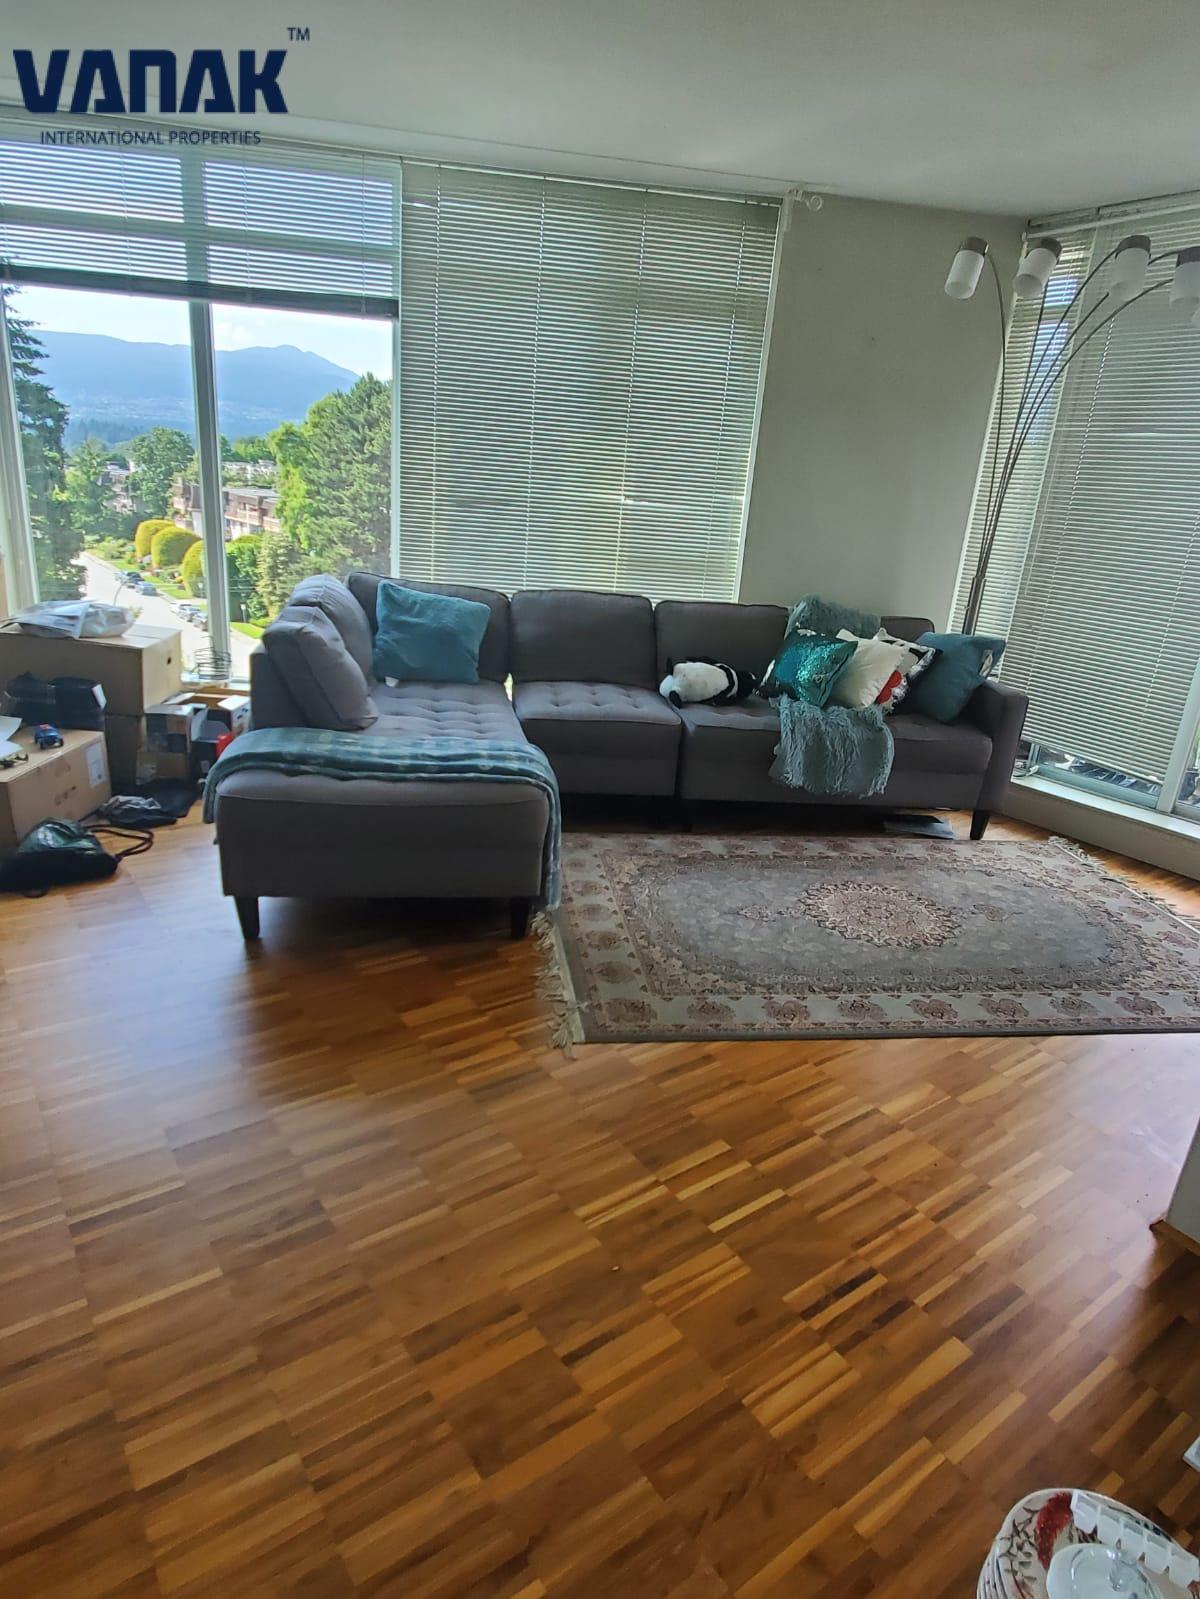 2nd west 175,North Vancouver,BC,Canada,2 Bedrooms Bedrooms,2 BathroomsBathrooms,Apartment,Ventana,175 ,1467